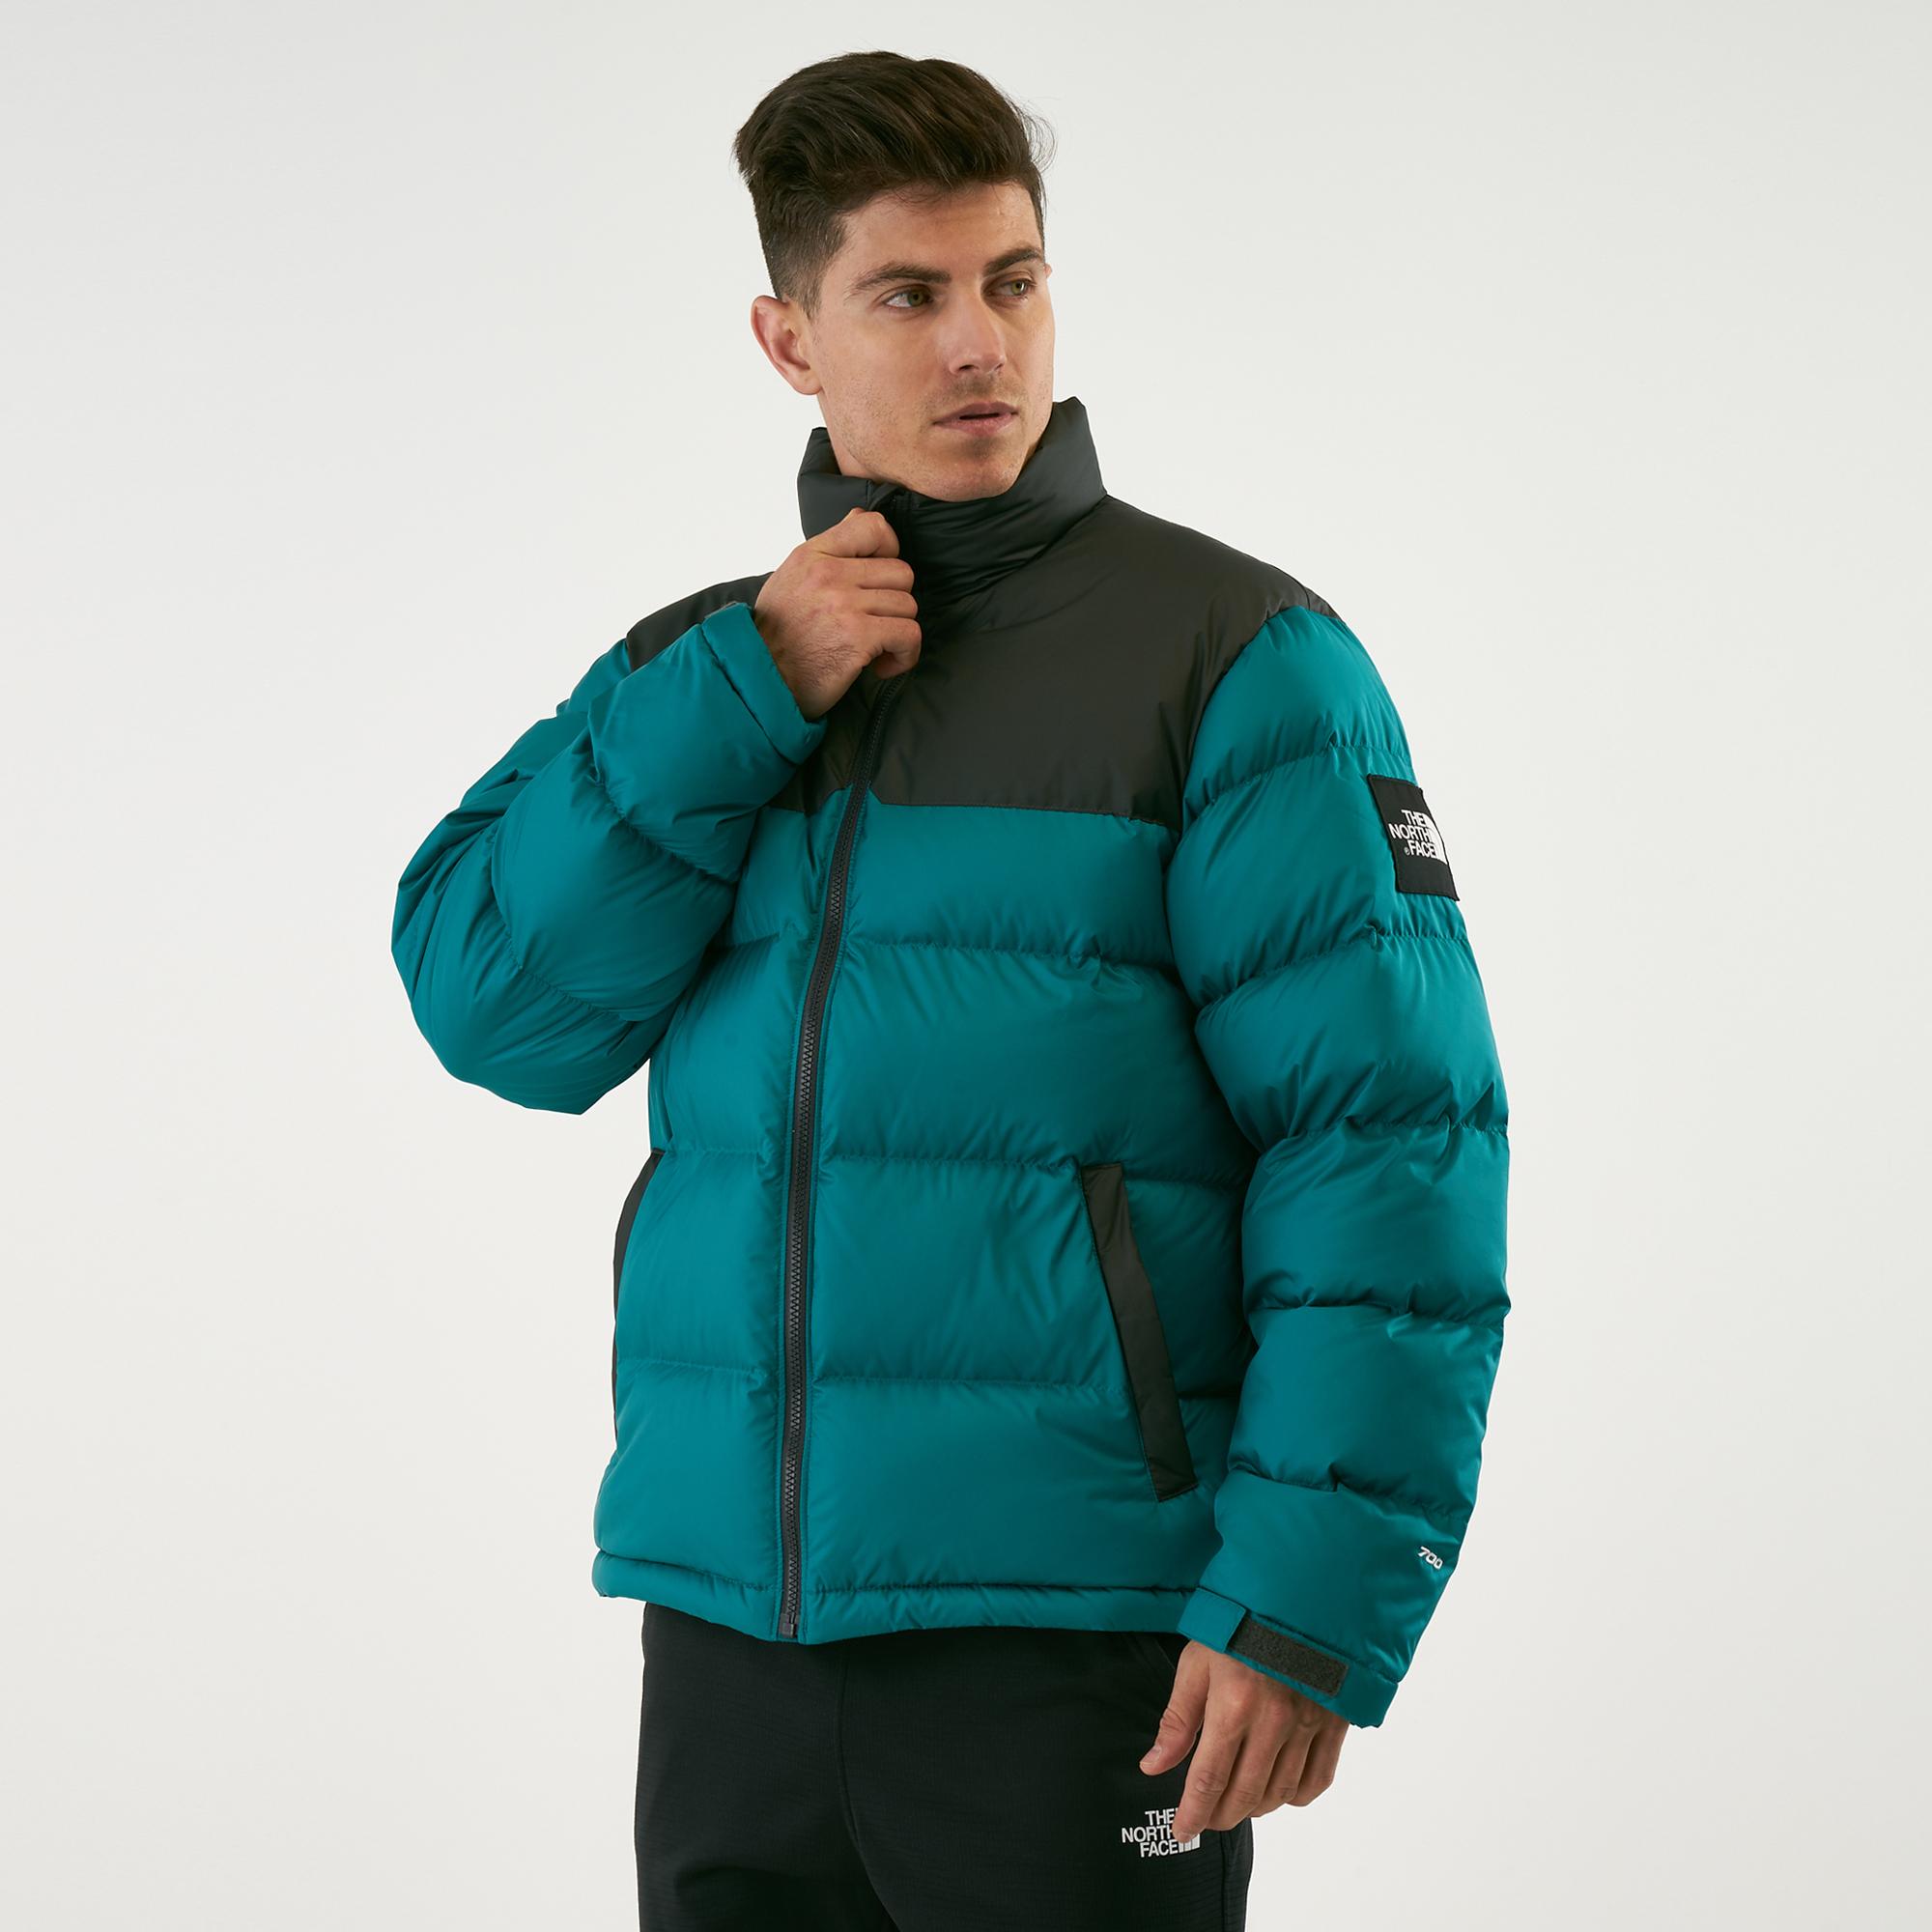 ce8fe85f4 The North Face Men's 1992 Nuptse Down Jacket